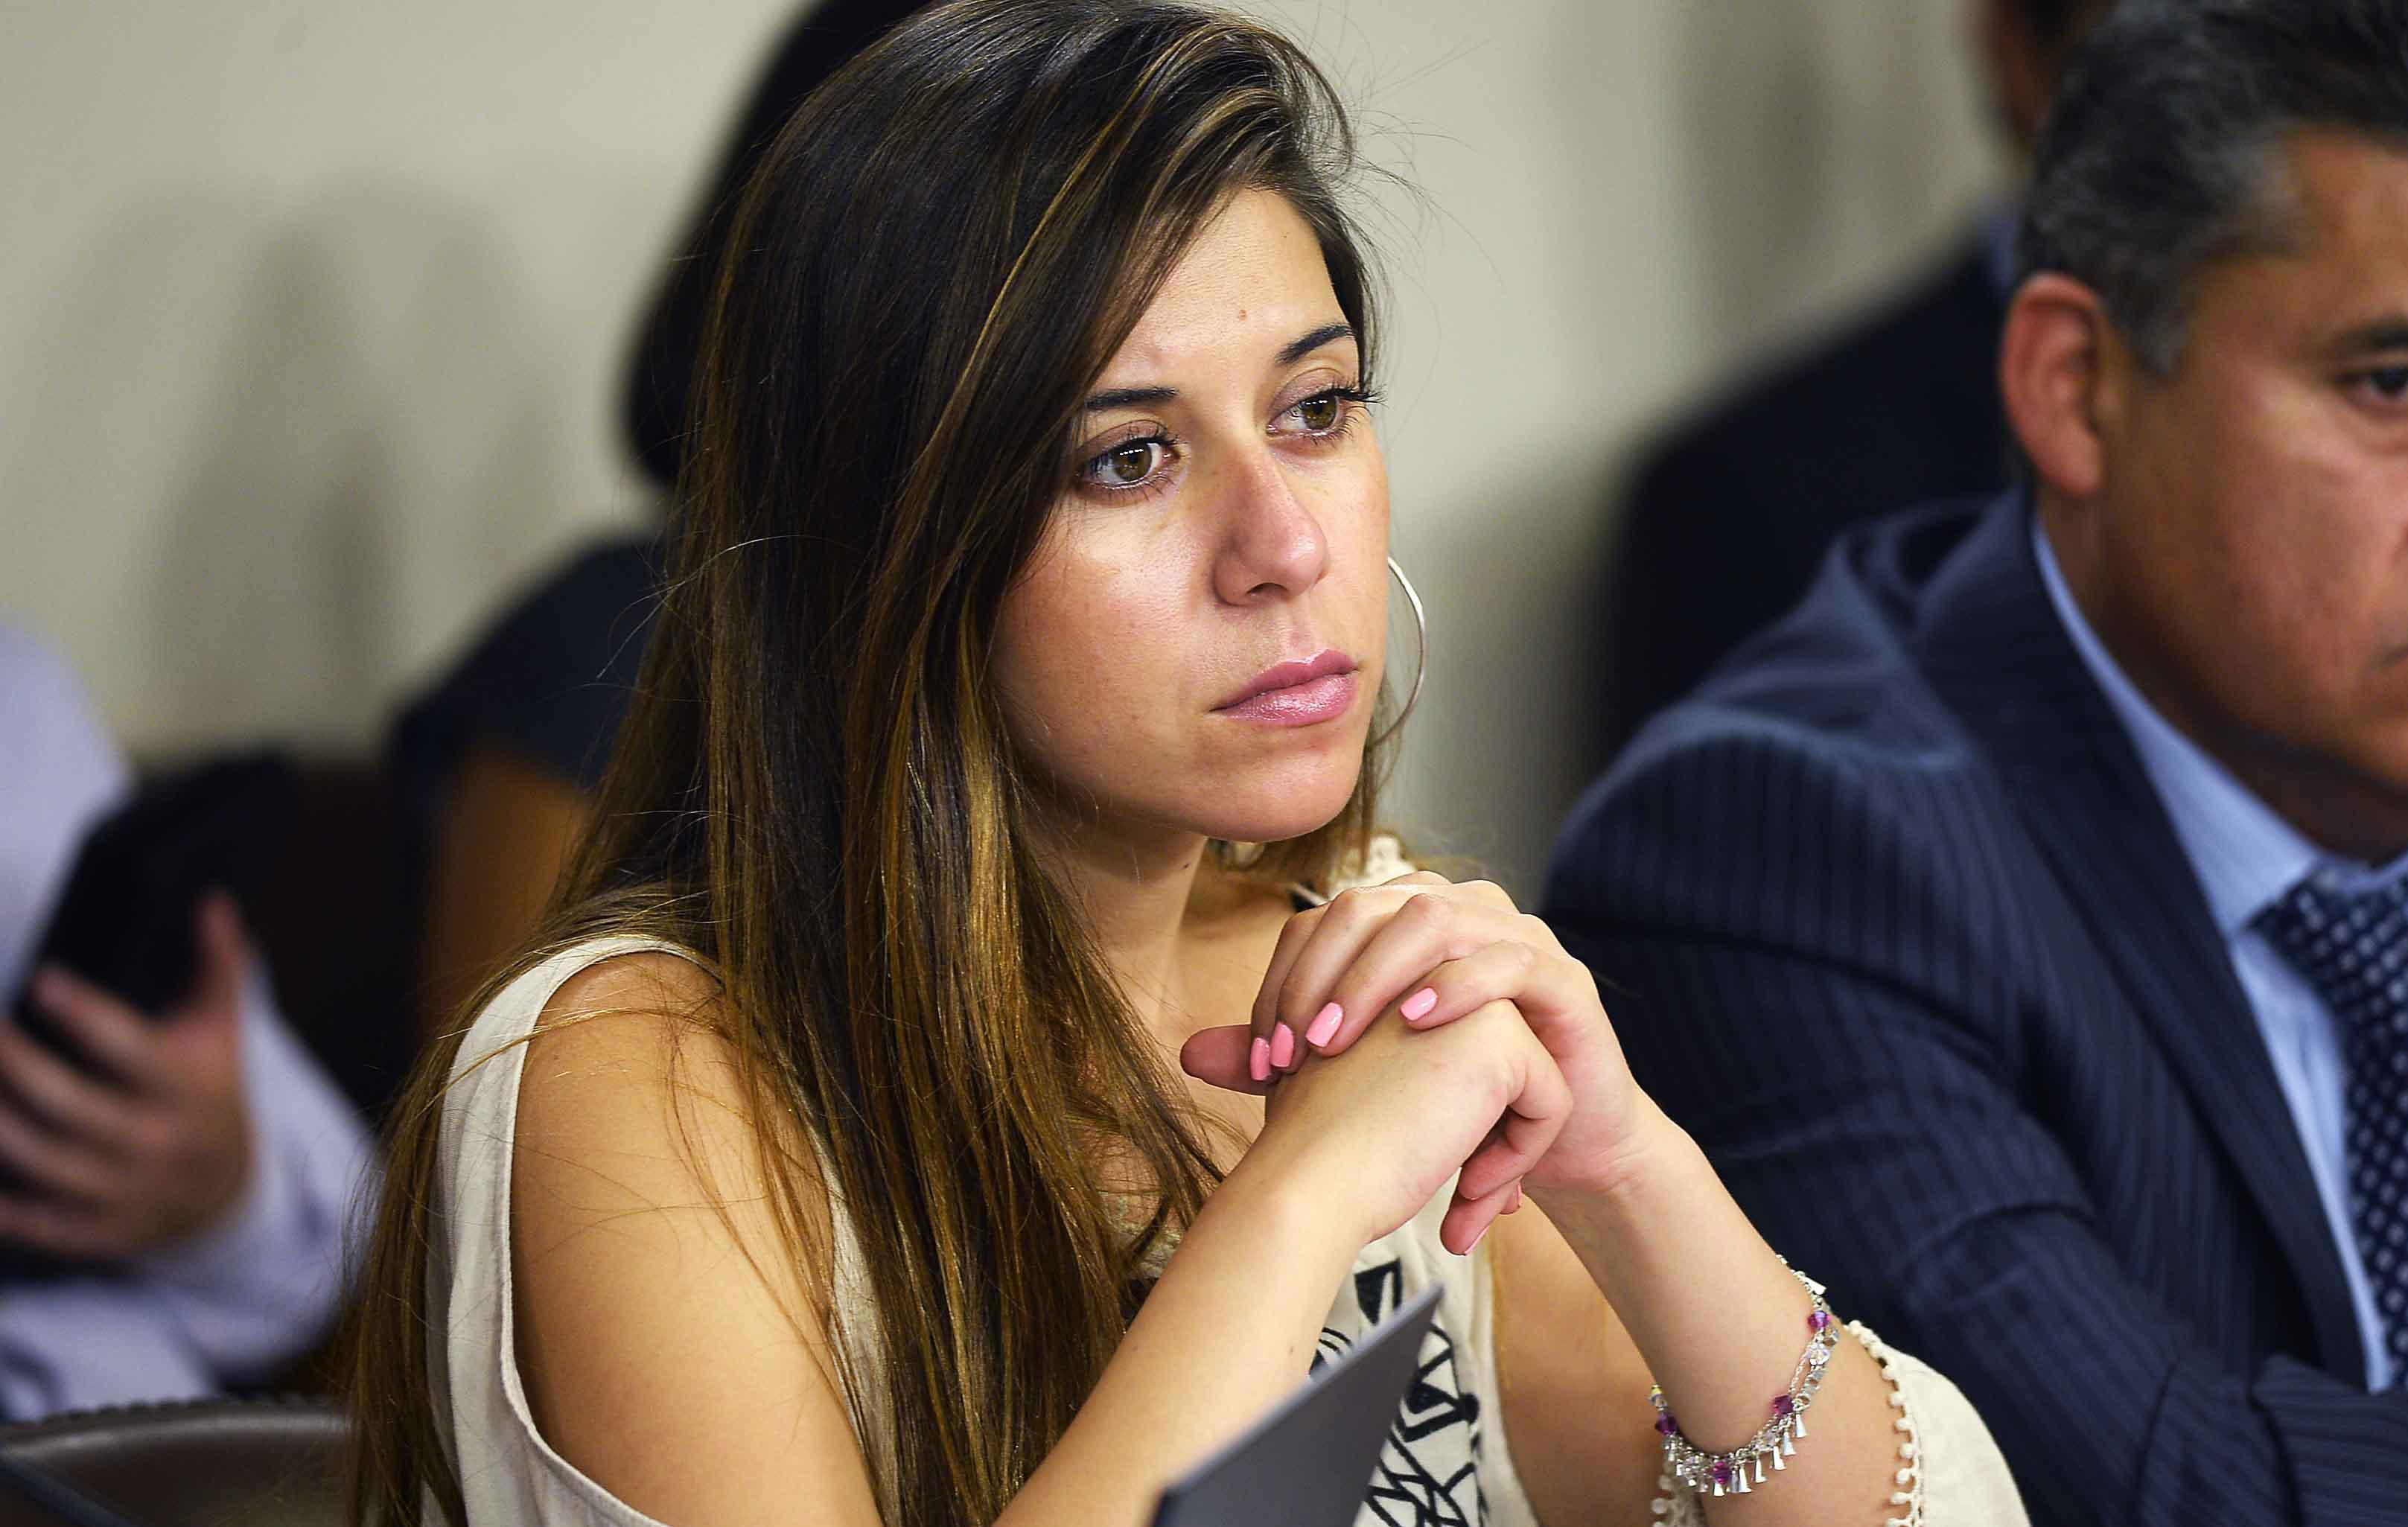 Diputada Cicardini acogió denuncia por irregularidades en despidos de Manipuladoras de Alimentos